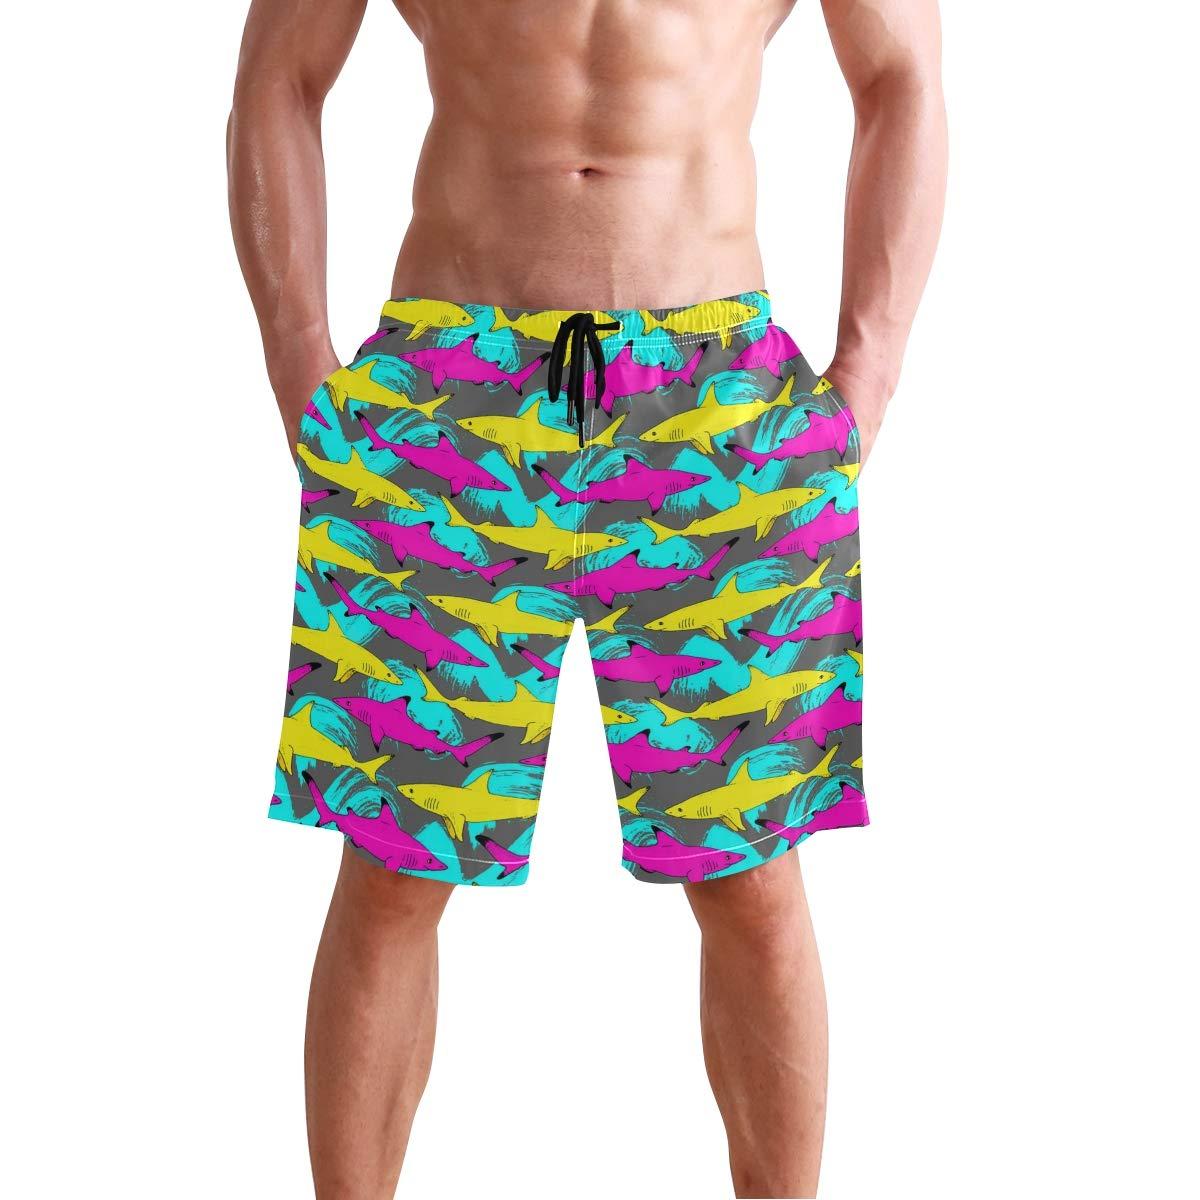 Shark Sea Animal Pattern Mens Swim Trunks 3D Printed Beach Board Shorts with Pockets for Teen Boys